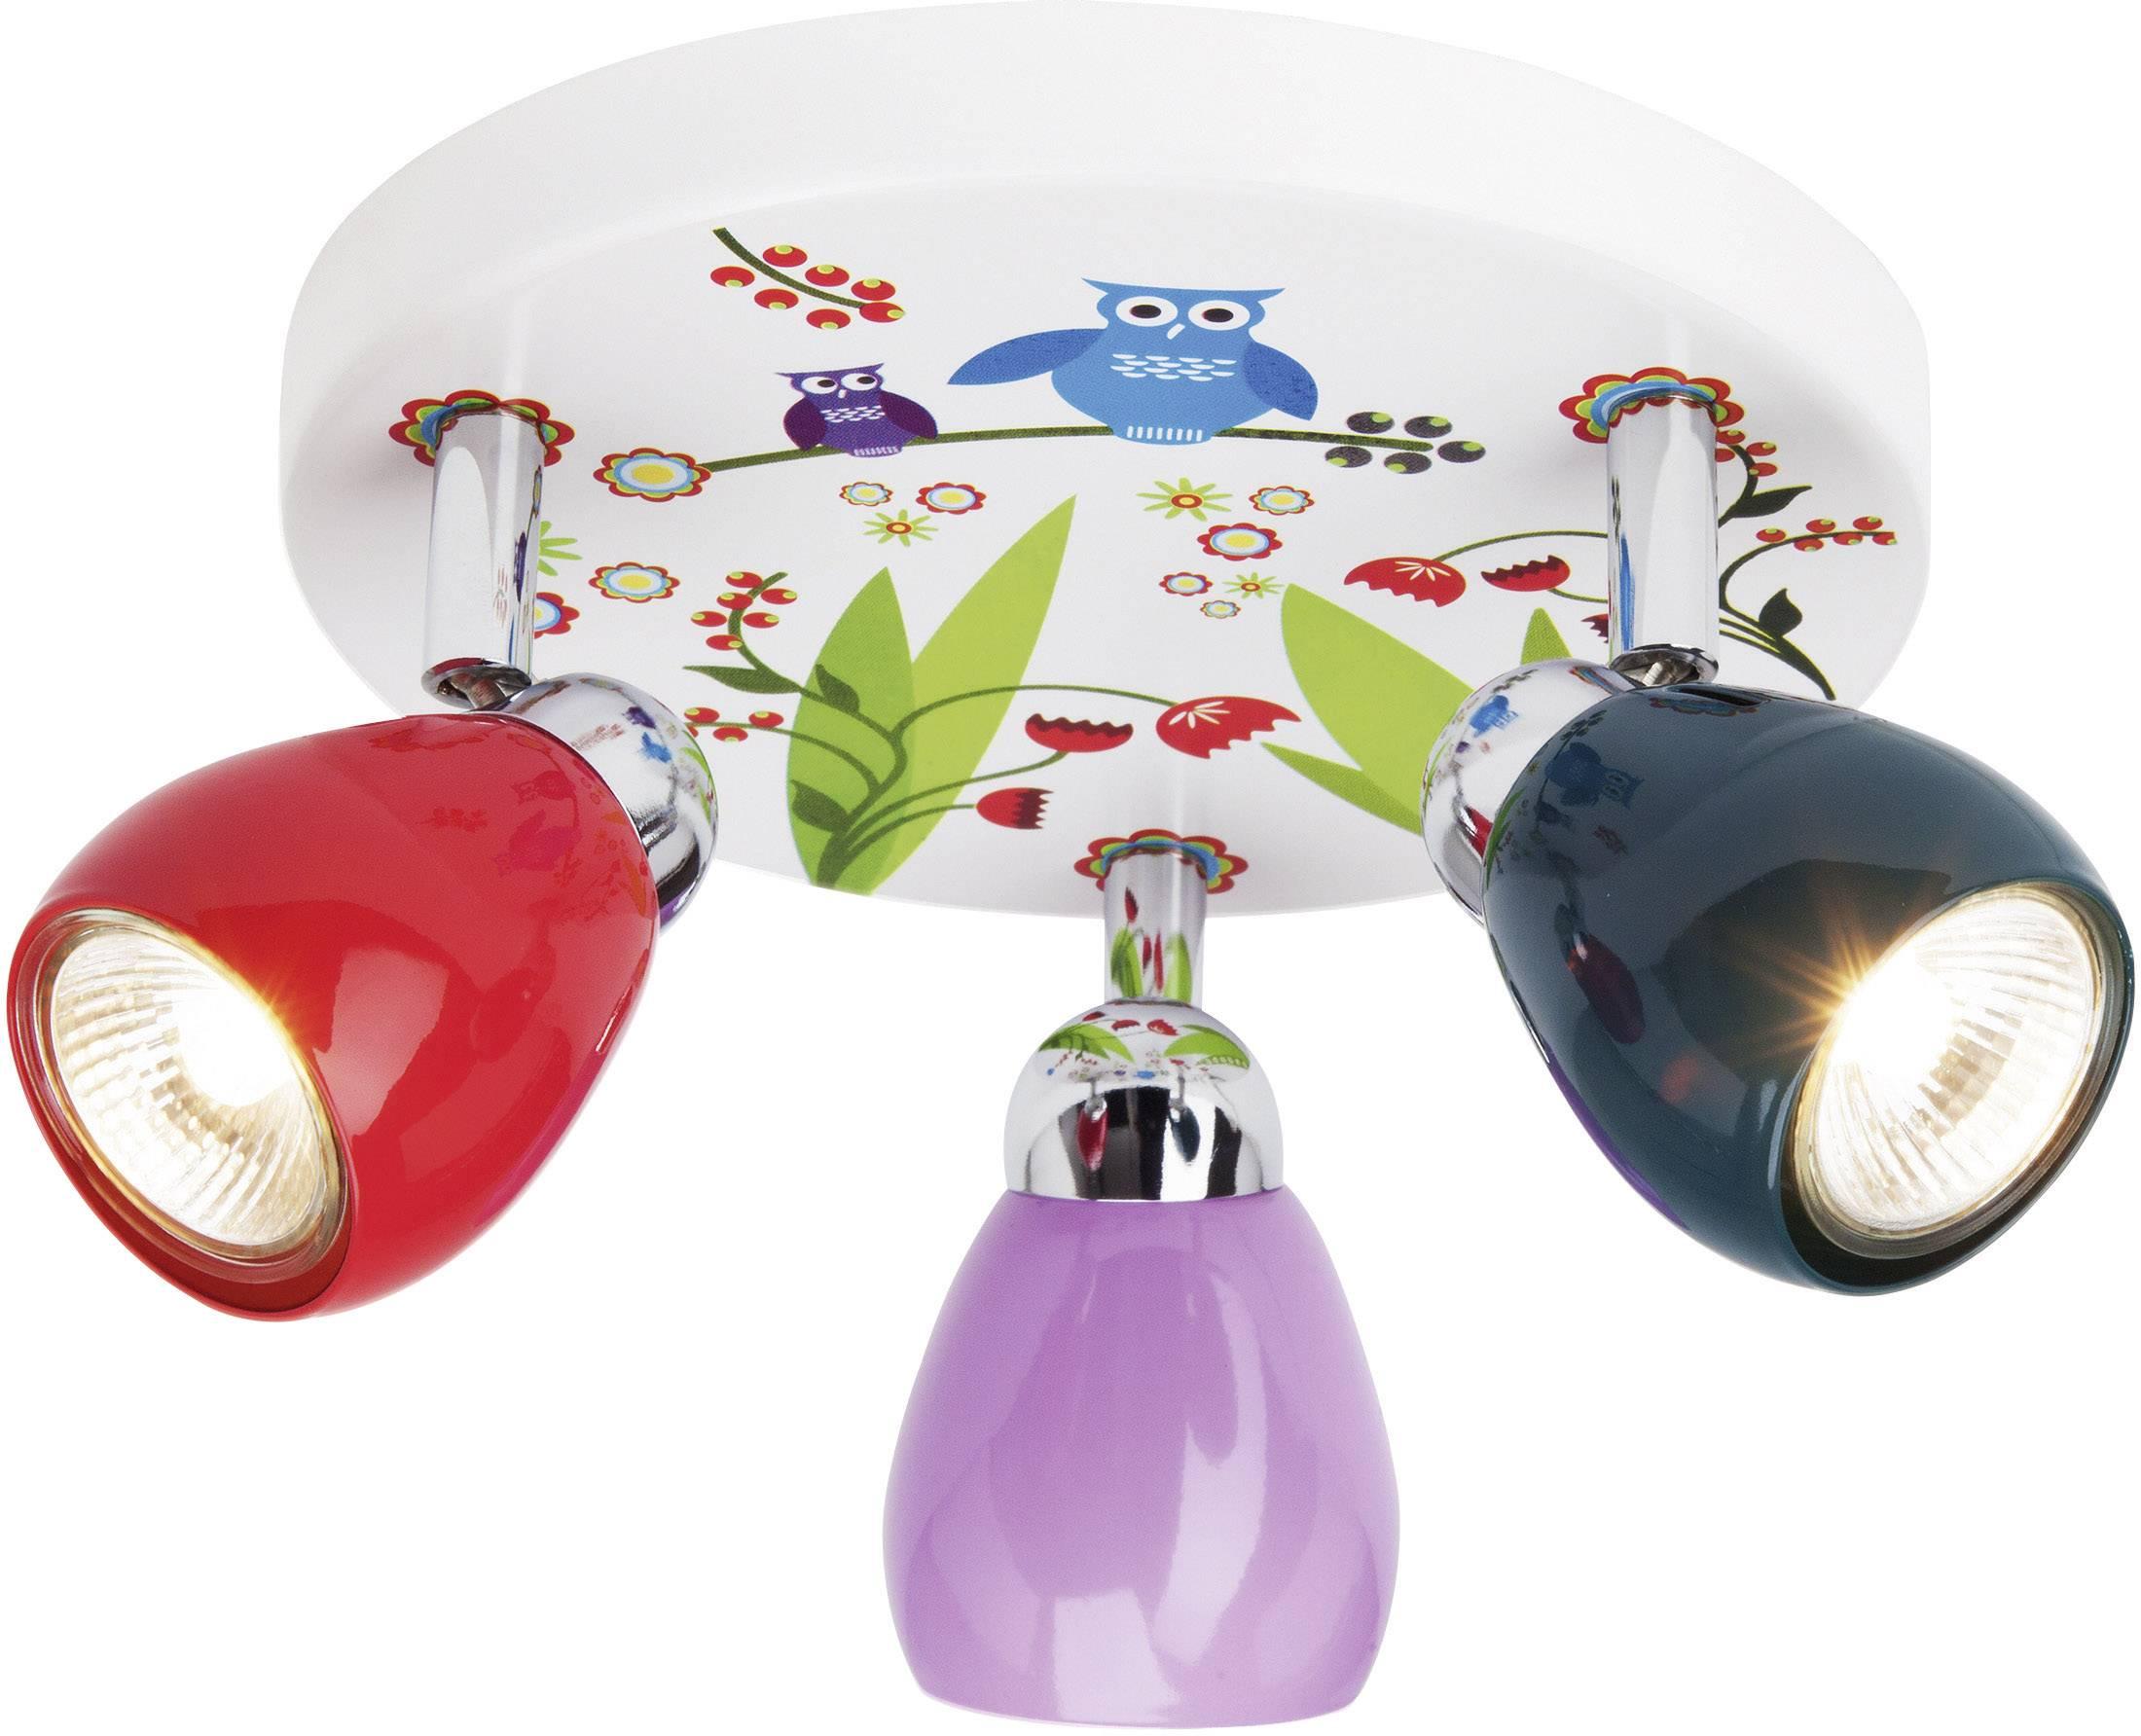 Briljant Lampje Kinderkamer : Kinderkamer plafondlampen kopen op conrad